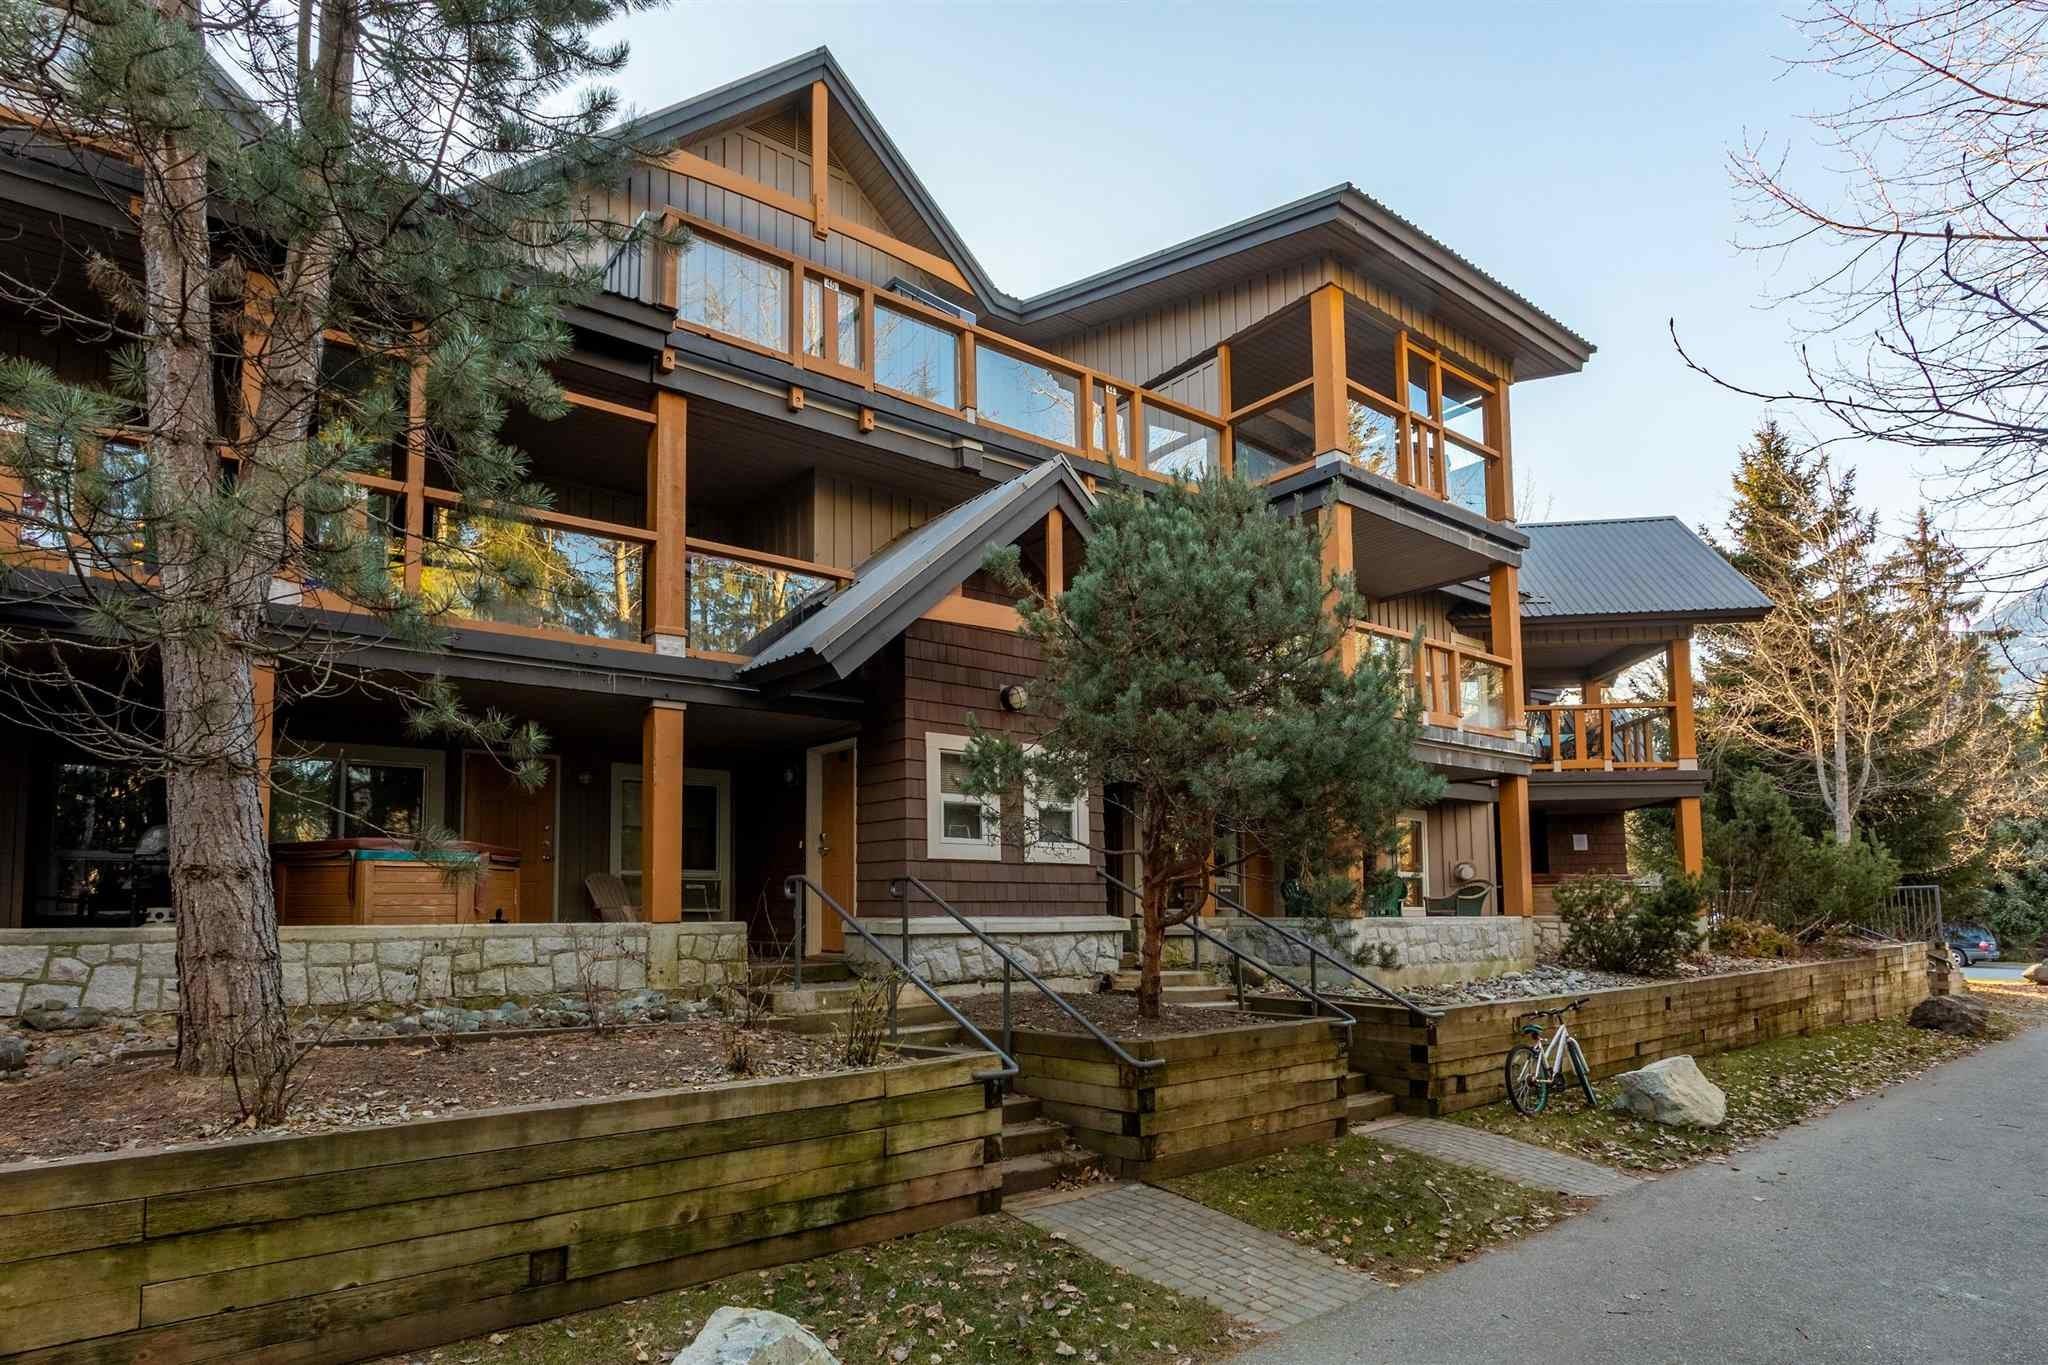 45 4388 NORTHLANDS BOULEVARD - Whistler Village Townhouse for sale, 2 Bedrooms (R2607530)